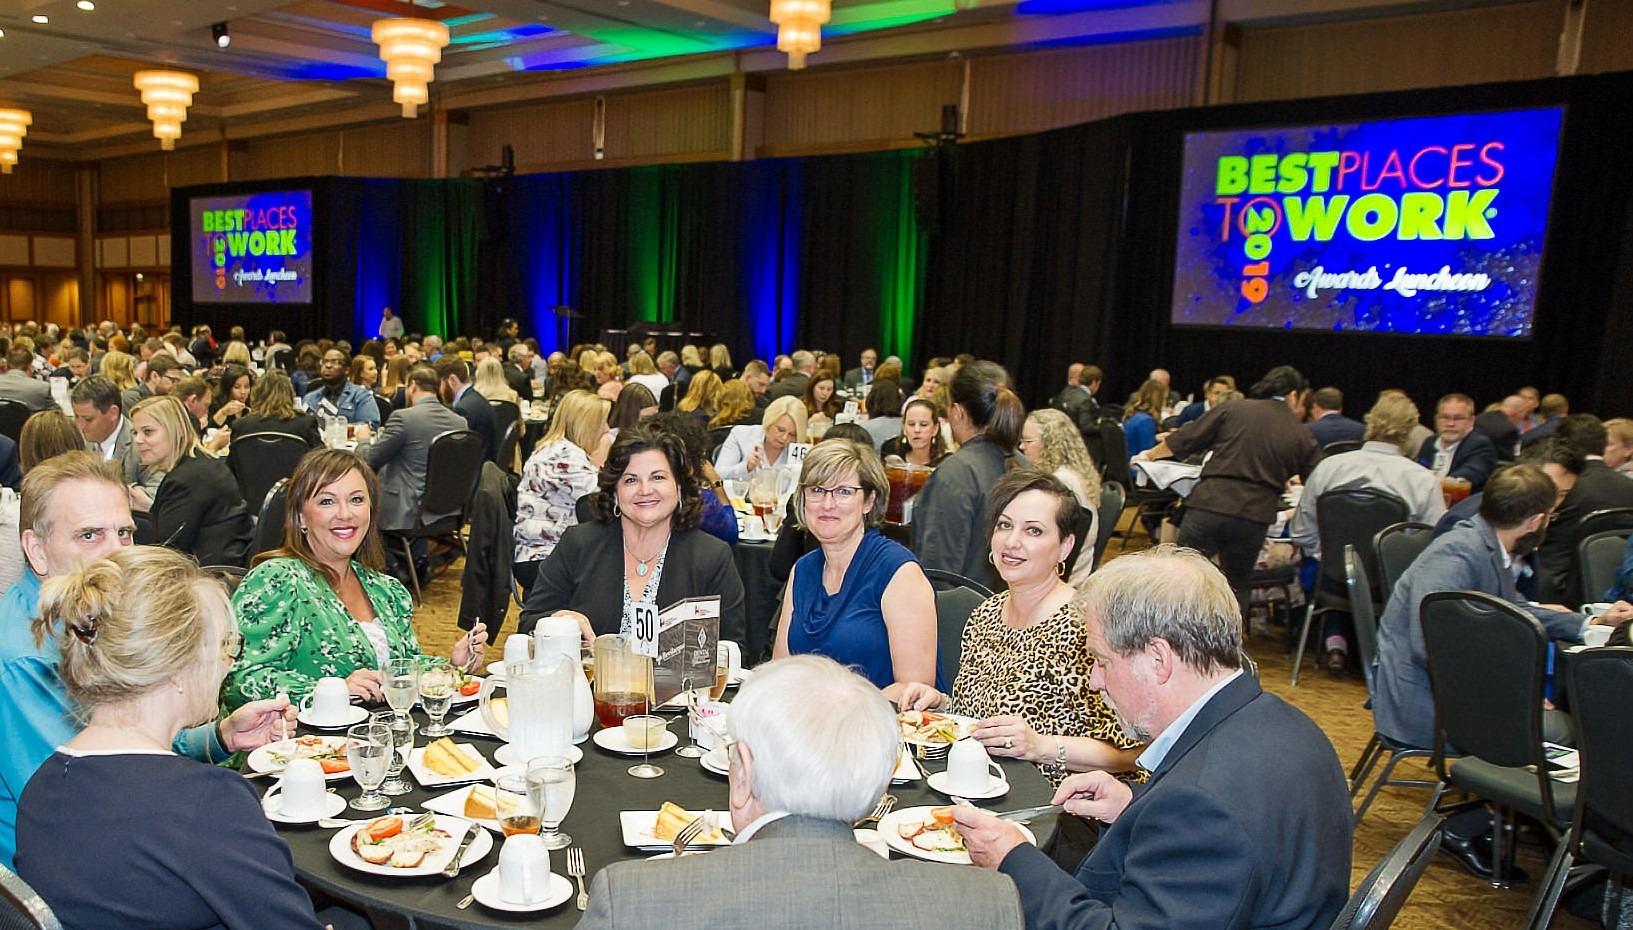 Huntsville/Madison County Chamber Announces 2019 Best